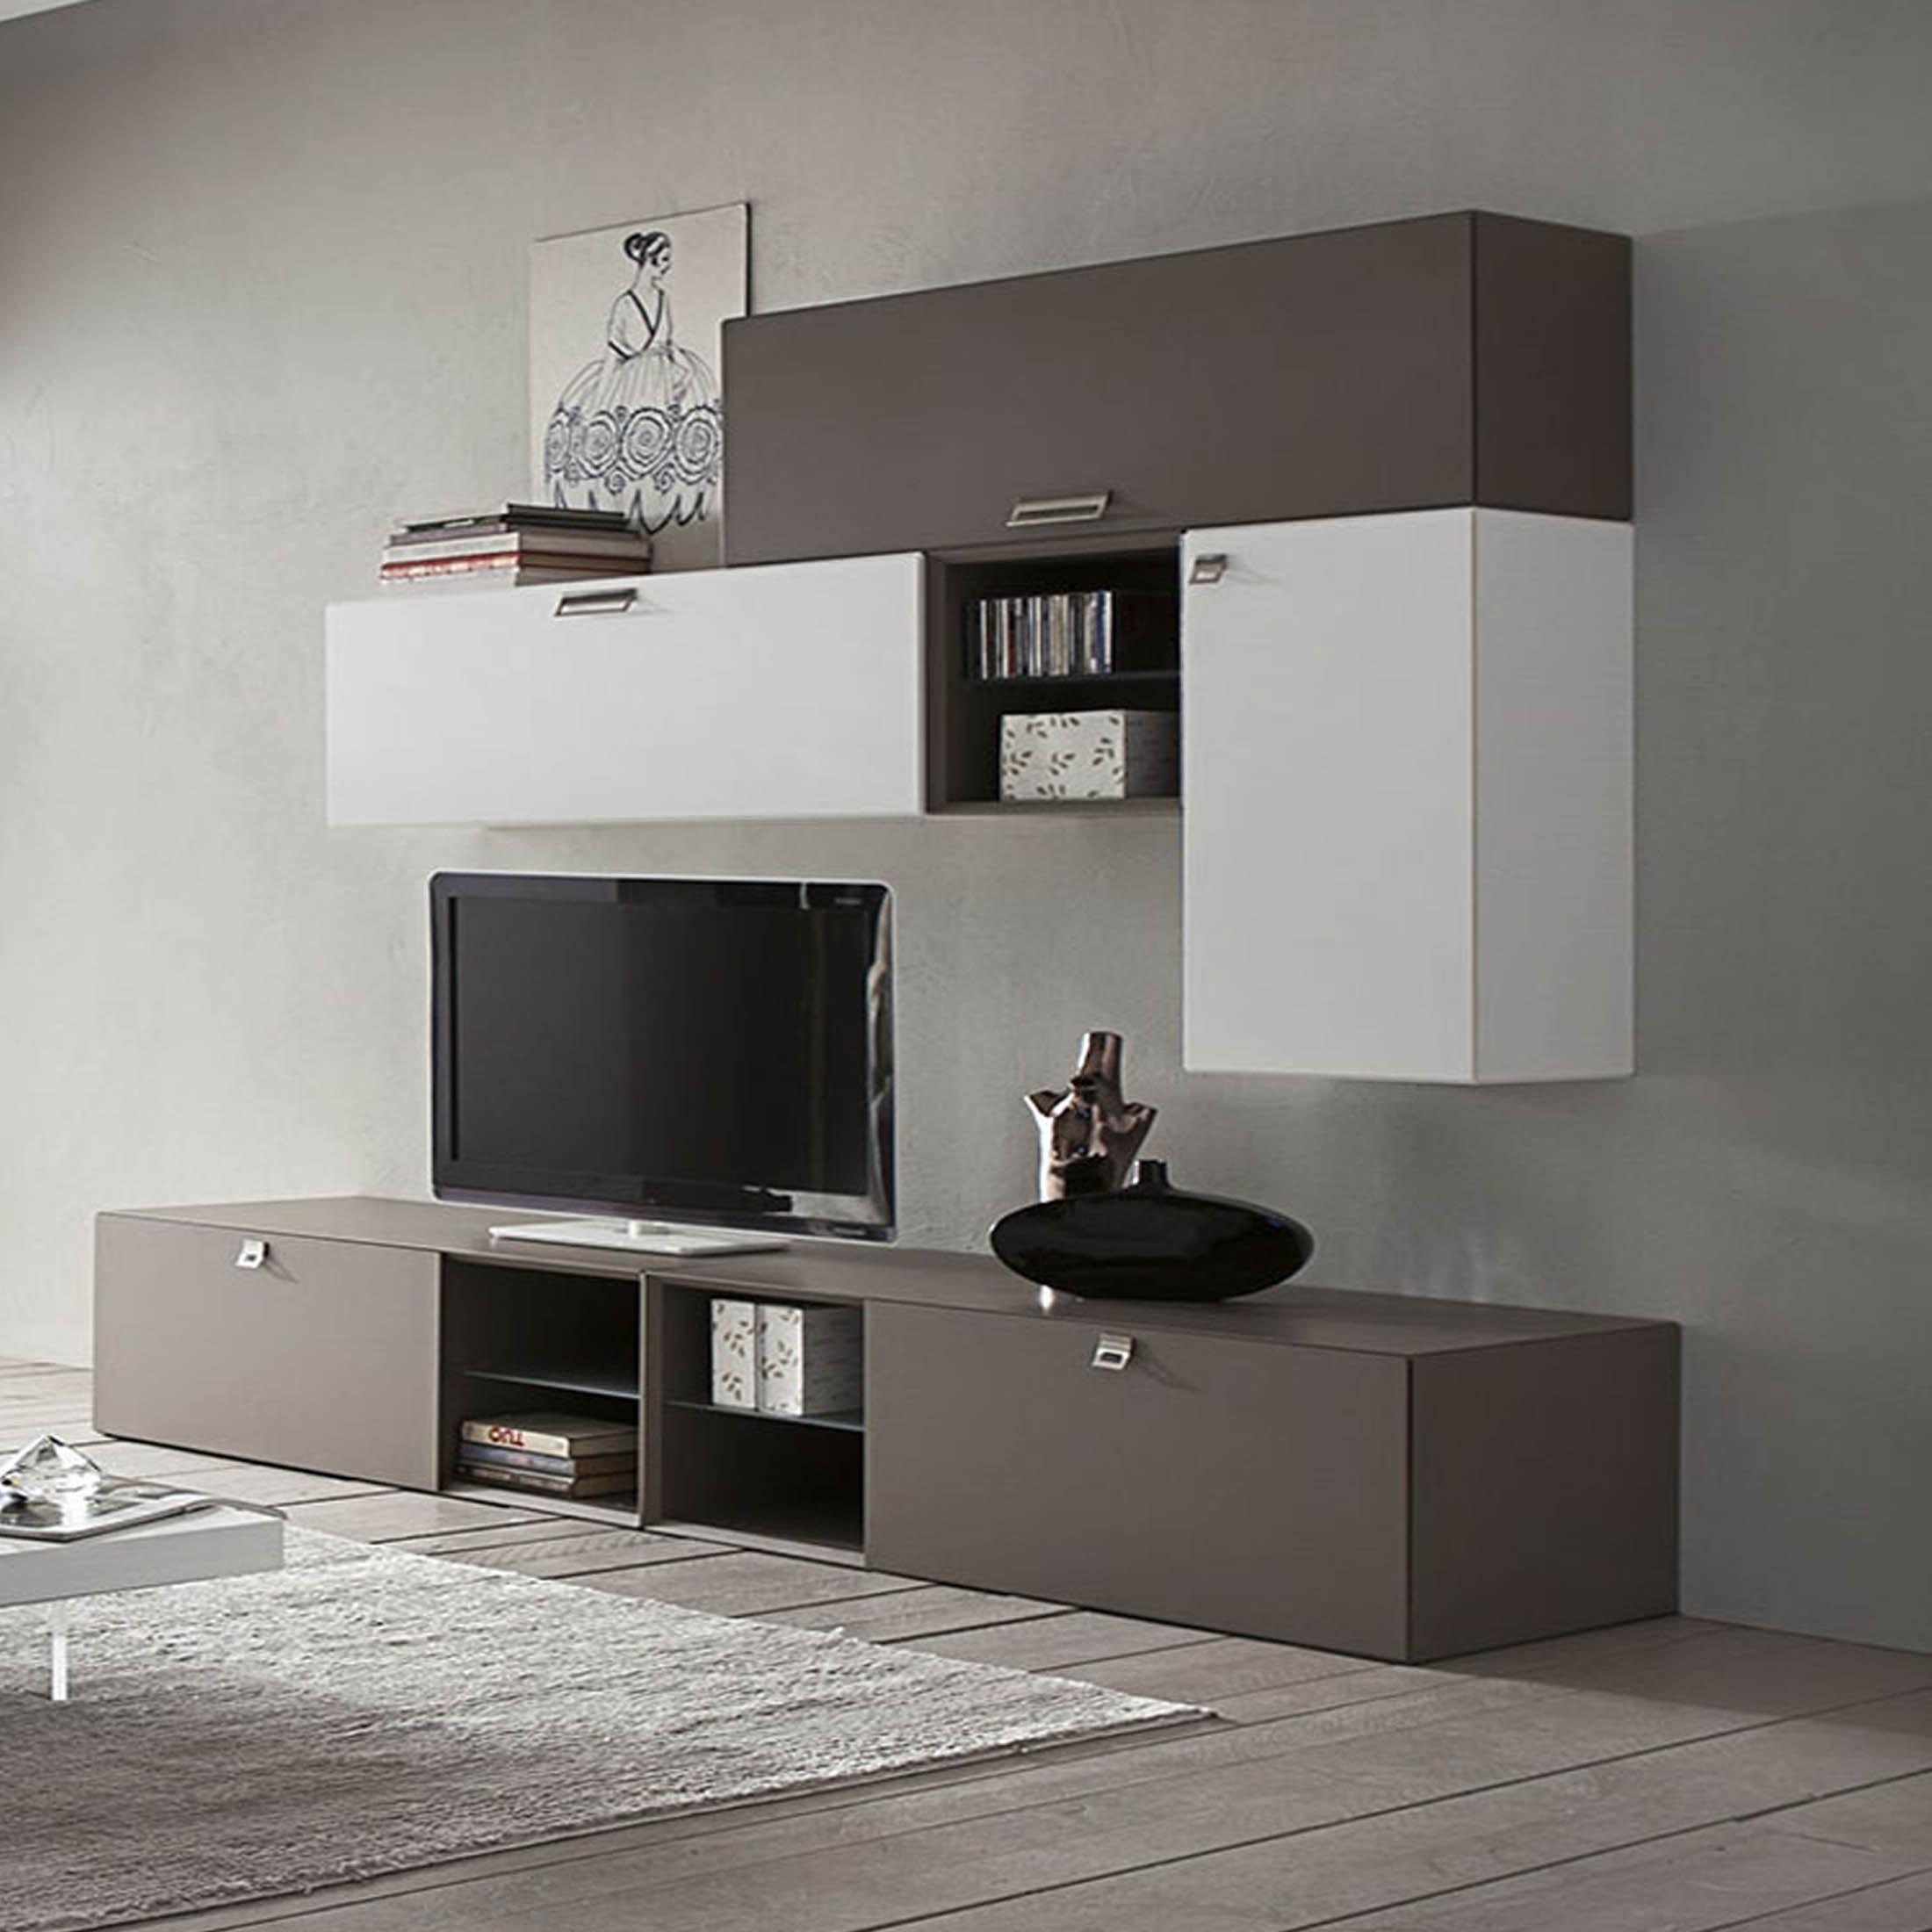 italian-modern-furniture-lego-wall-mounted-bookcase-tv-unit-media-stand-lounge-living-room-by-la-primavera.jpg